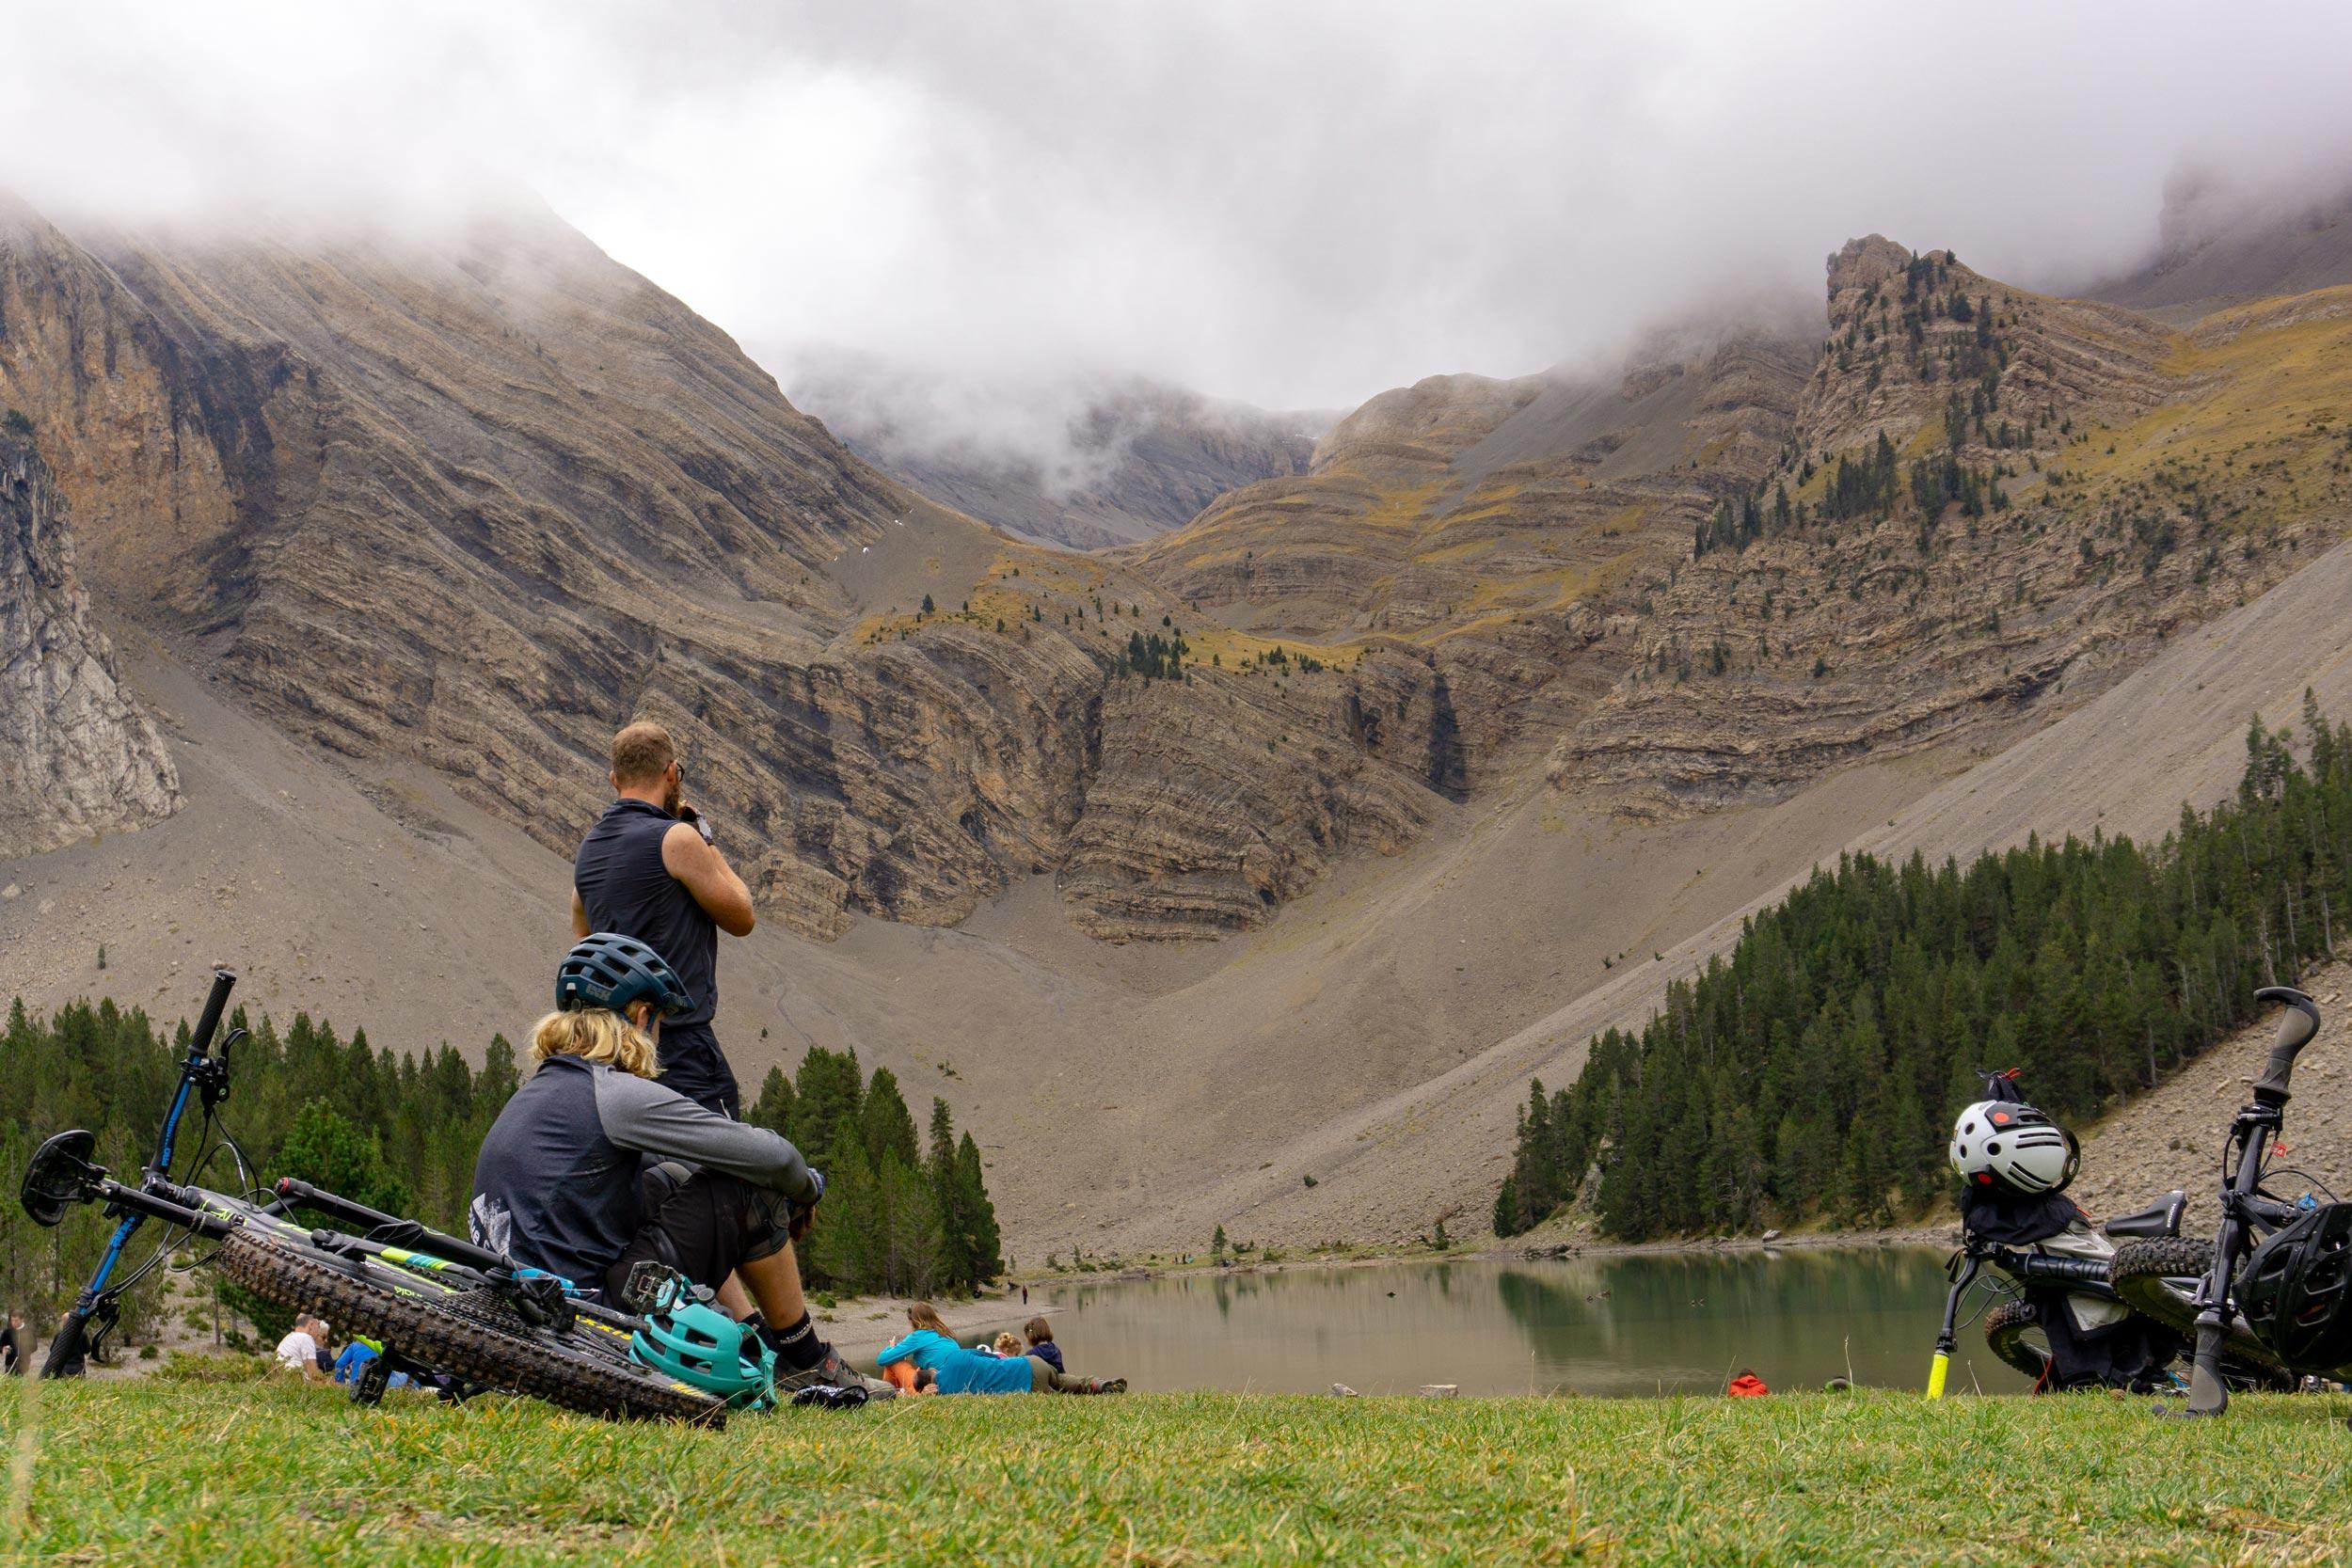 unbeaten-adventures-mountain-biking-pyrenees-zona-zero-ainsa-ibon-de-plan-wouter-jeroen. jpg